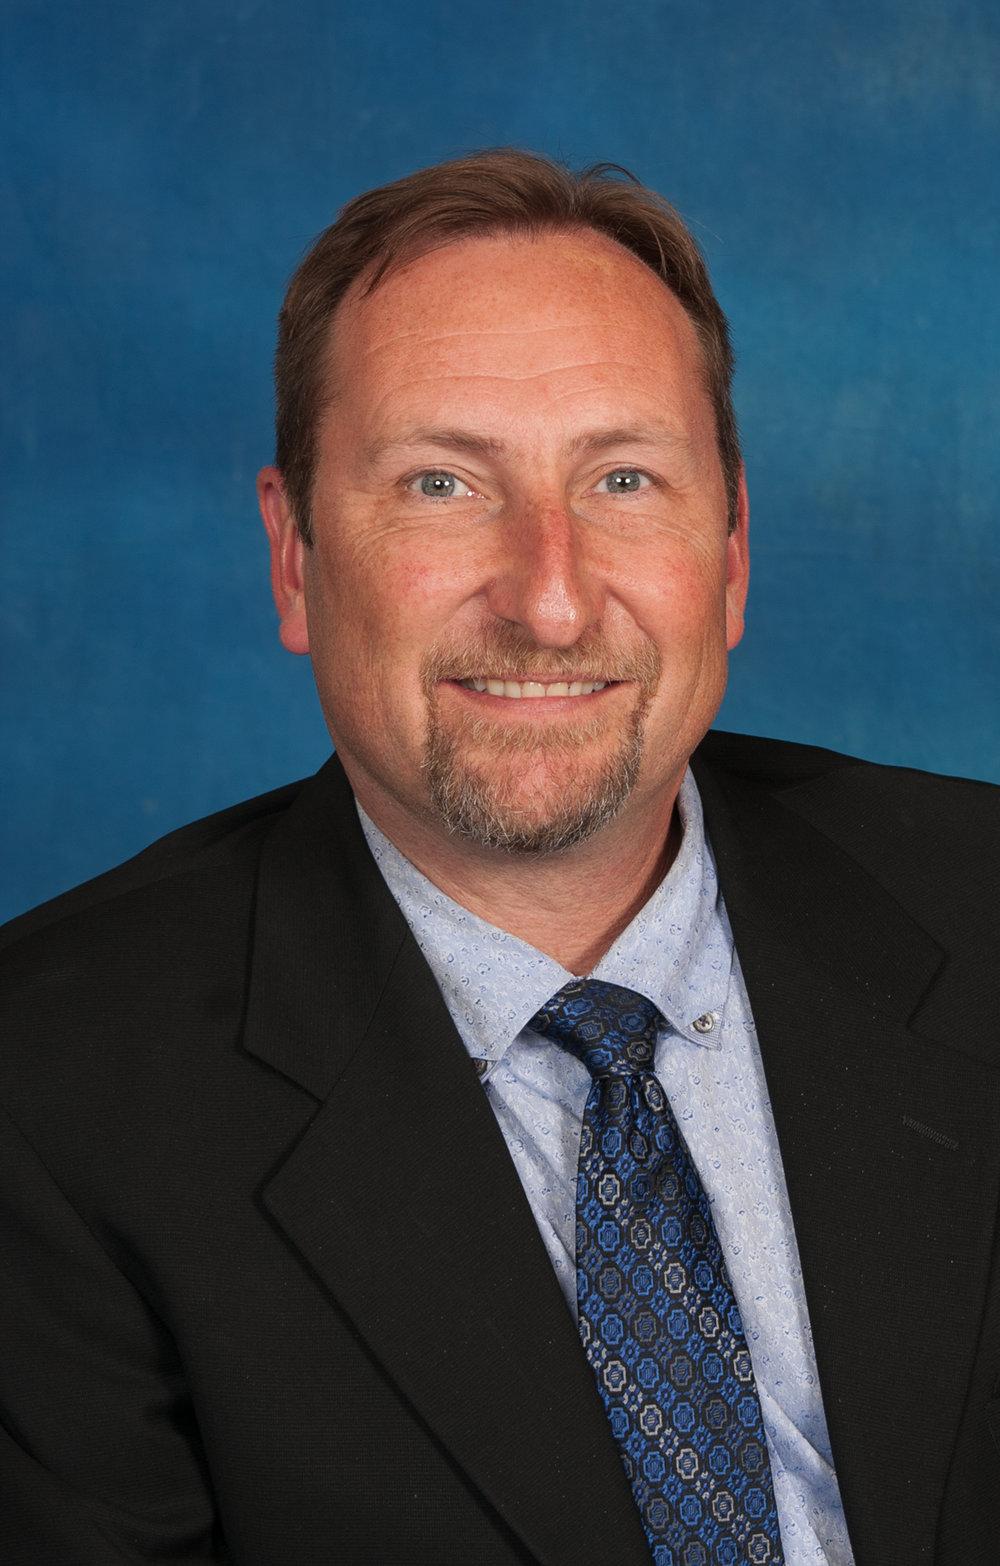 Dr. Daniel Burkhead President Elect